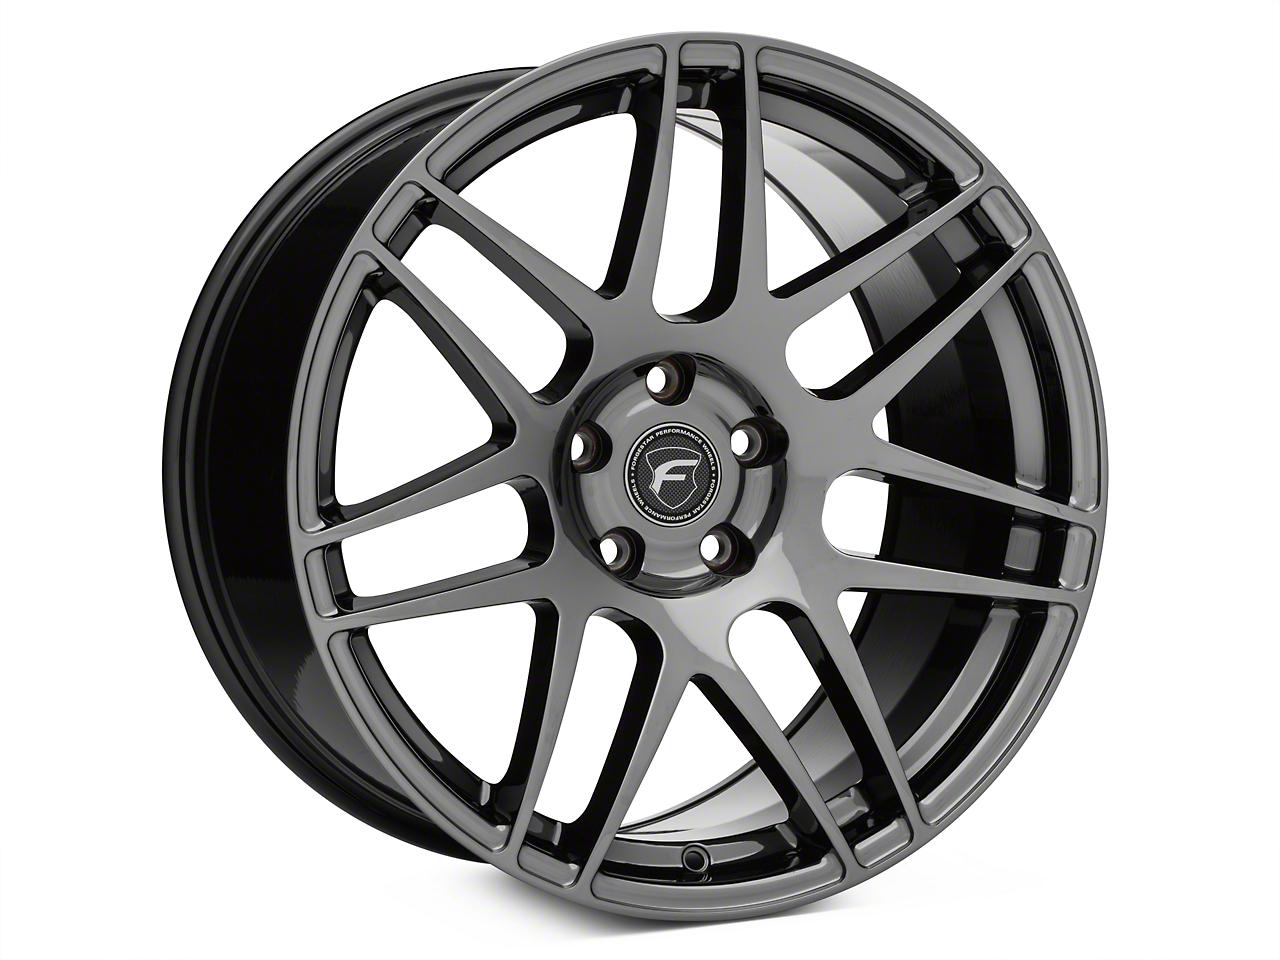 Forgestar F14 Monoblock Black Nickel Wheel - 19x10 (05-14 All)